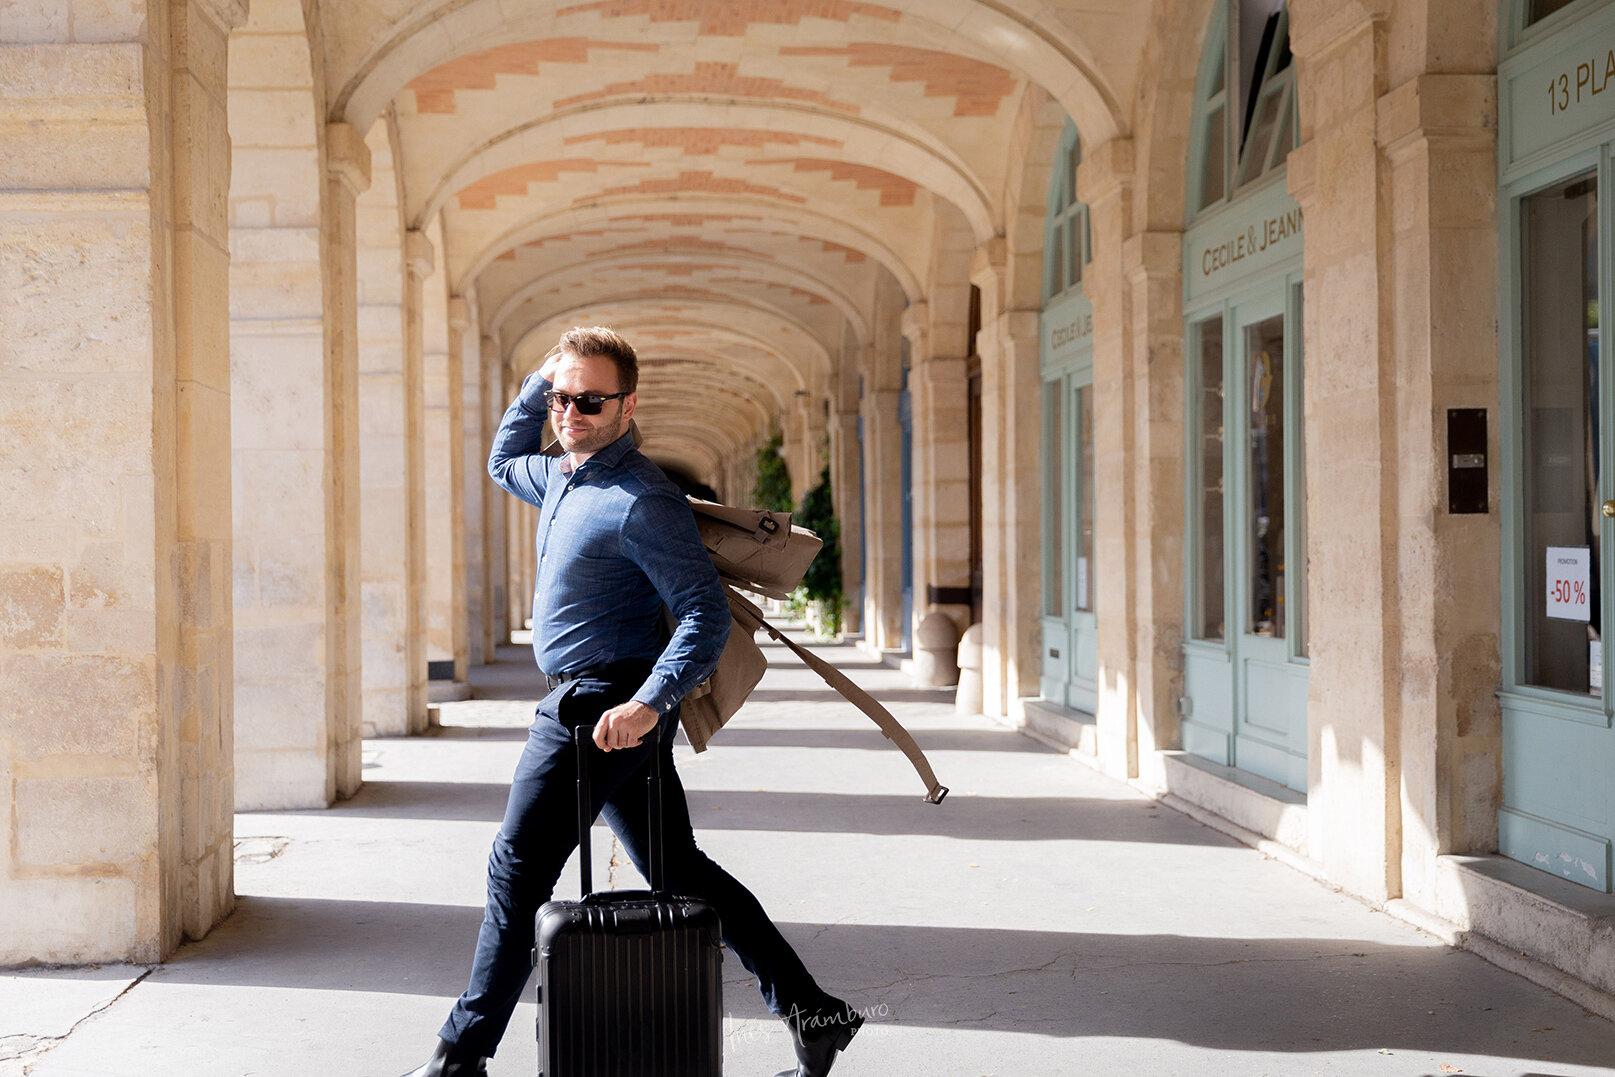 Ines-Aramburo-photographe-paris-corporate-lifestyle-photographer12.jpg